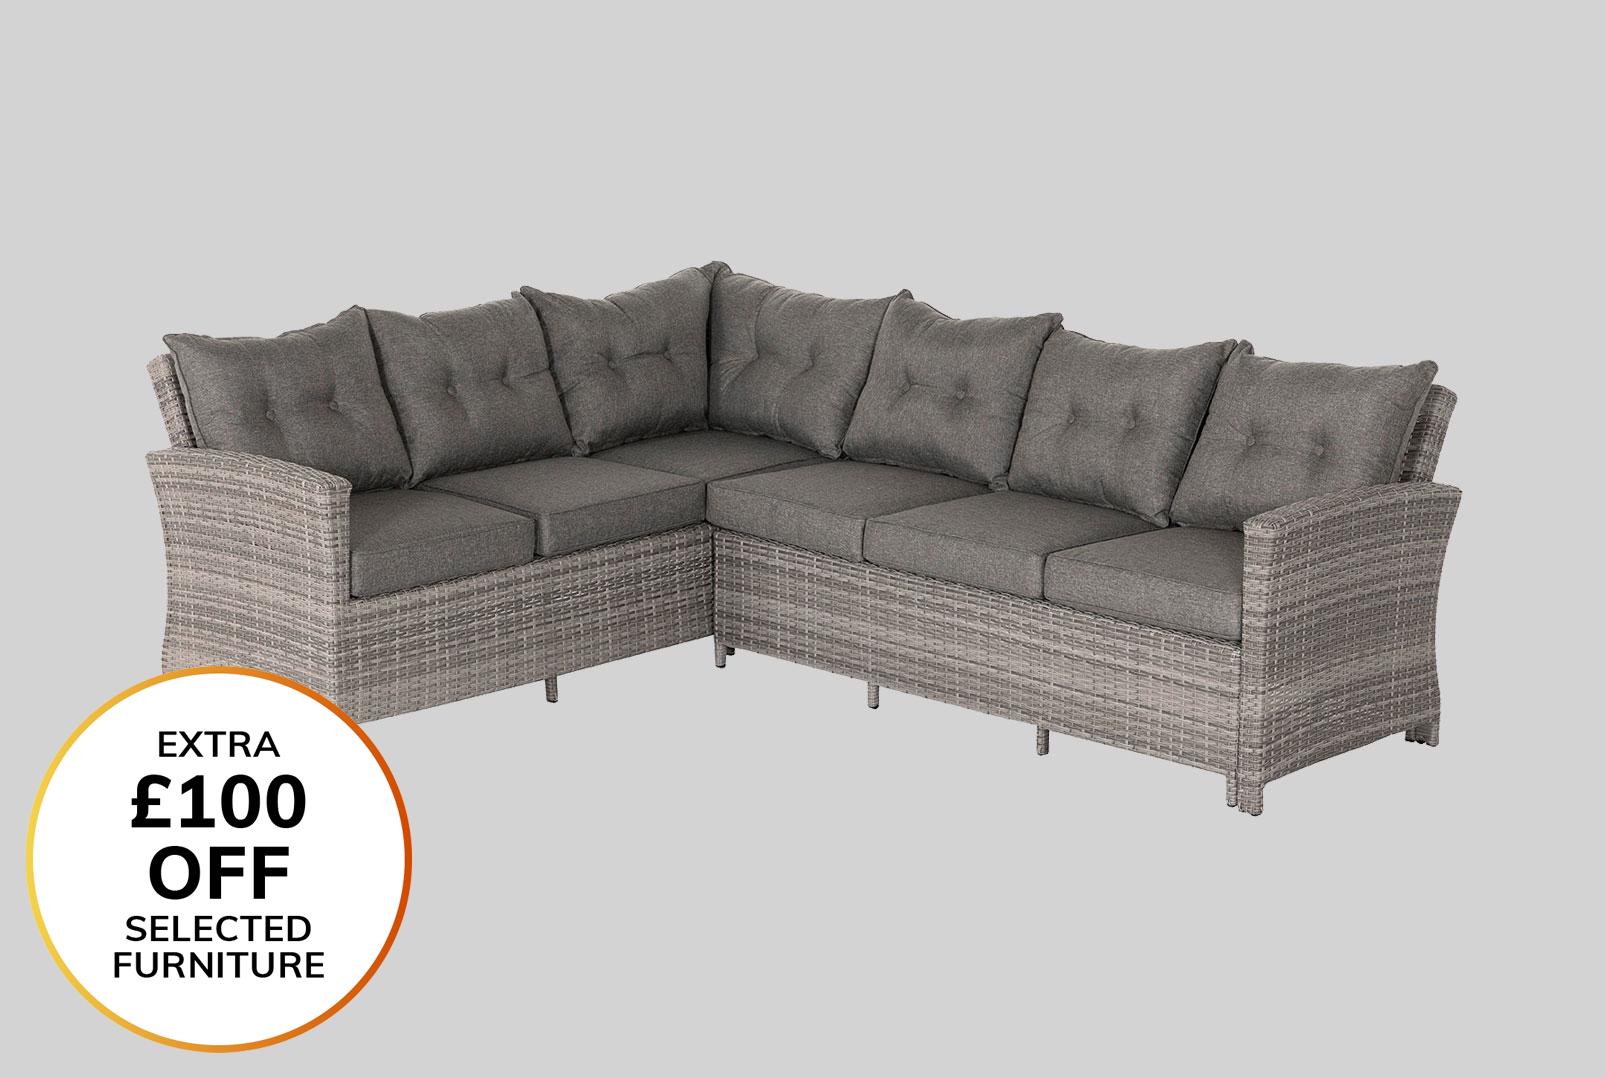 Patio Sofa Sets Uk 349 99 Outsunny 5 Pcs Rattan Sofa Set Brown